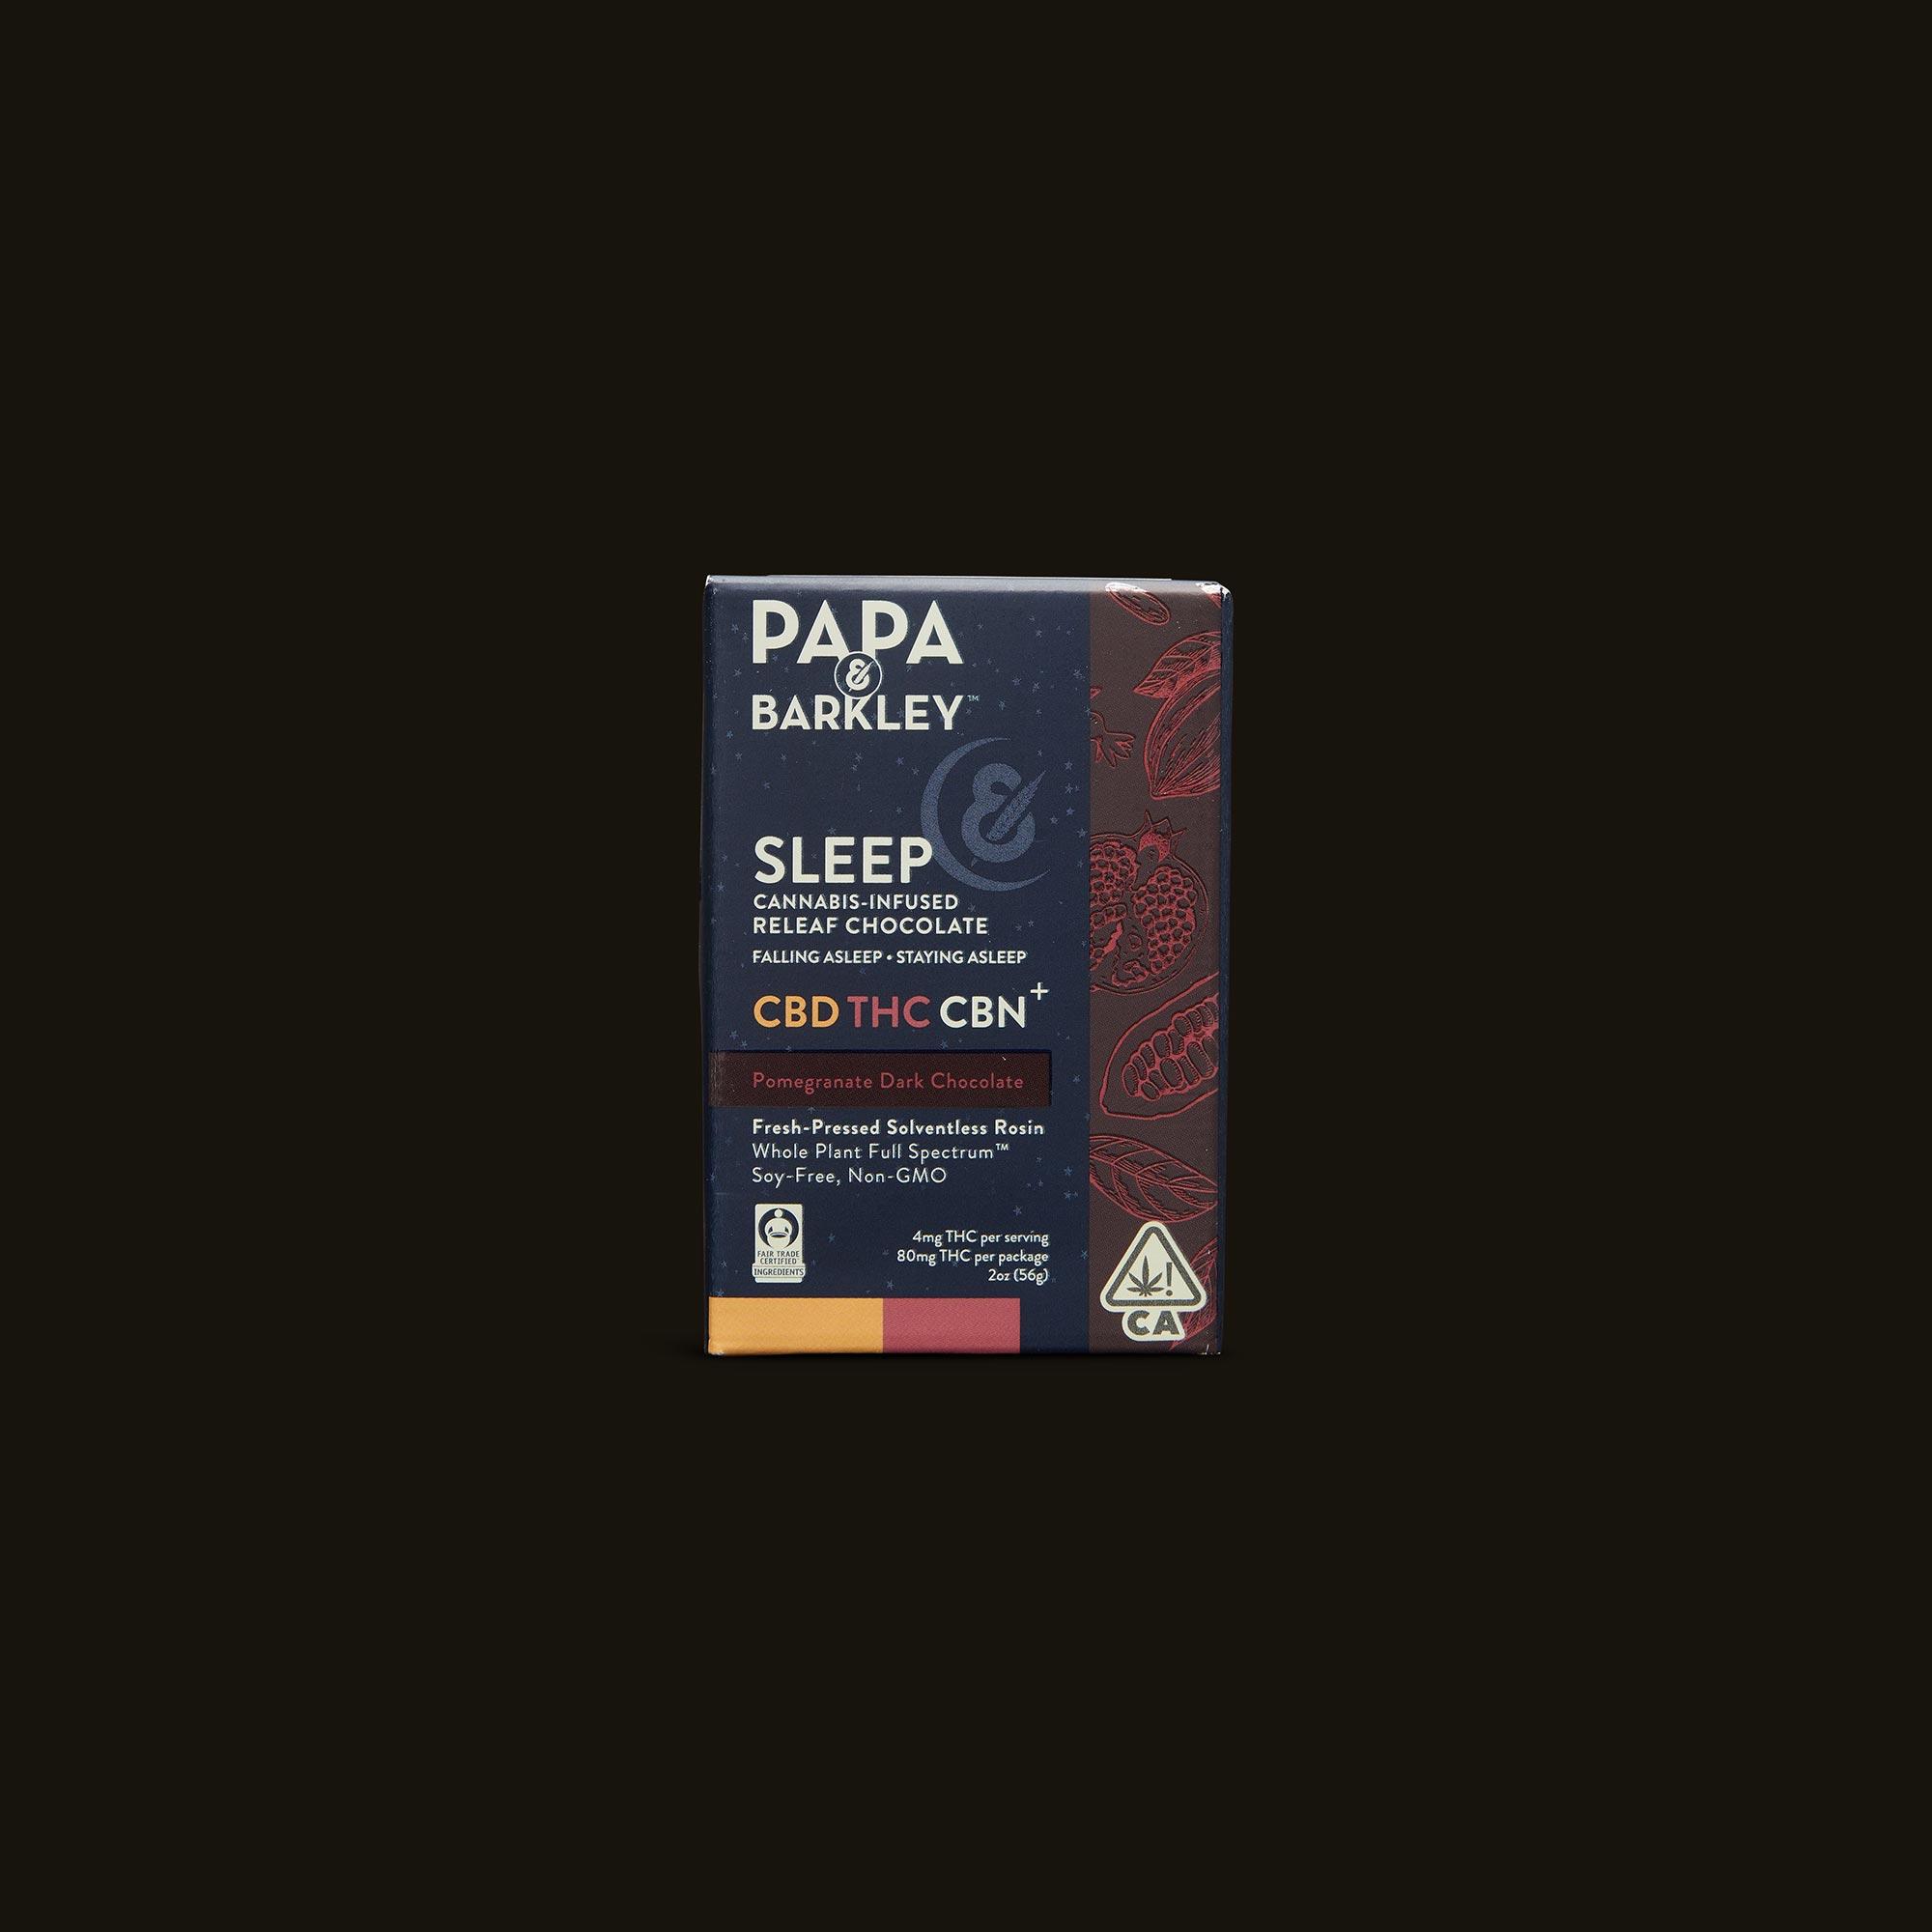 Sleep Pomegranate Dark Chocolate - 20 triangles (60mg CBD, 80mg THC, 20mg CBN)